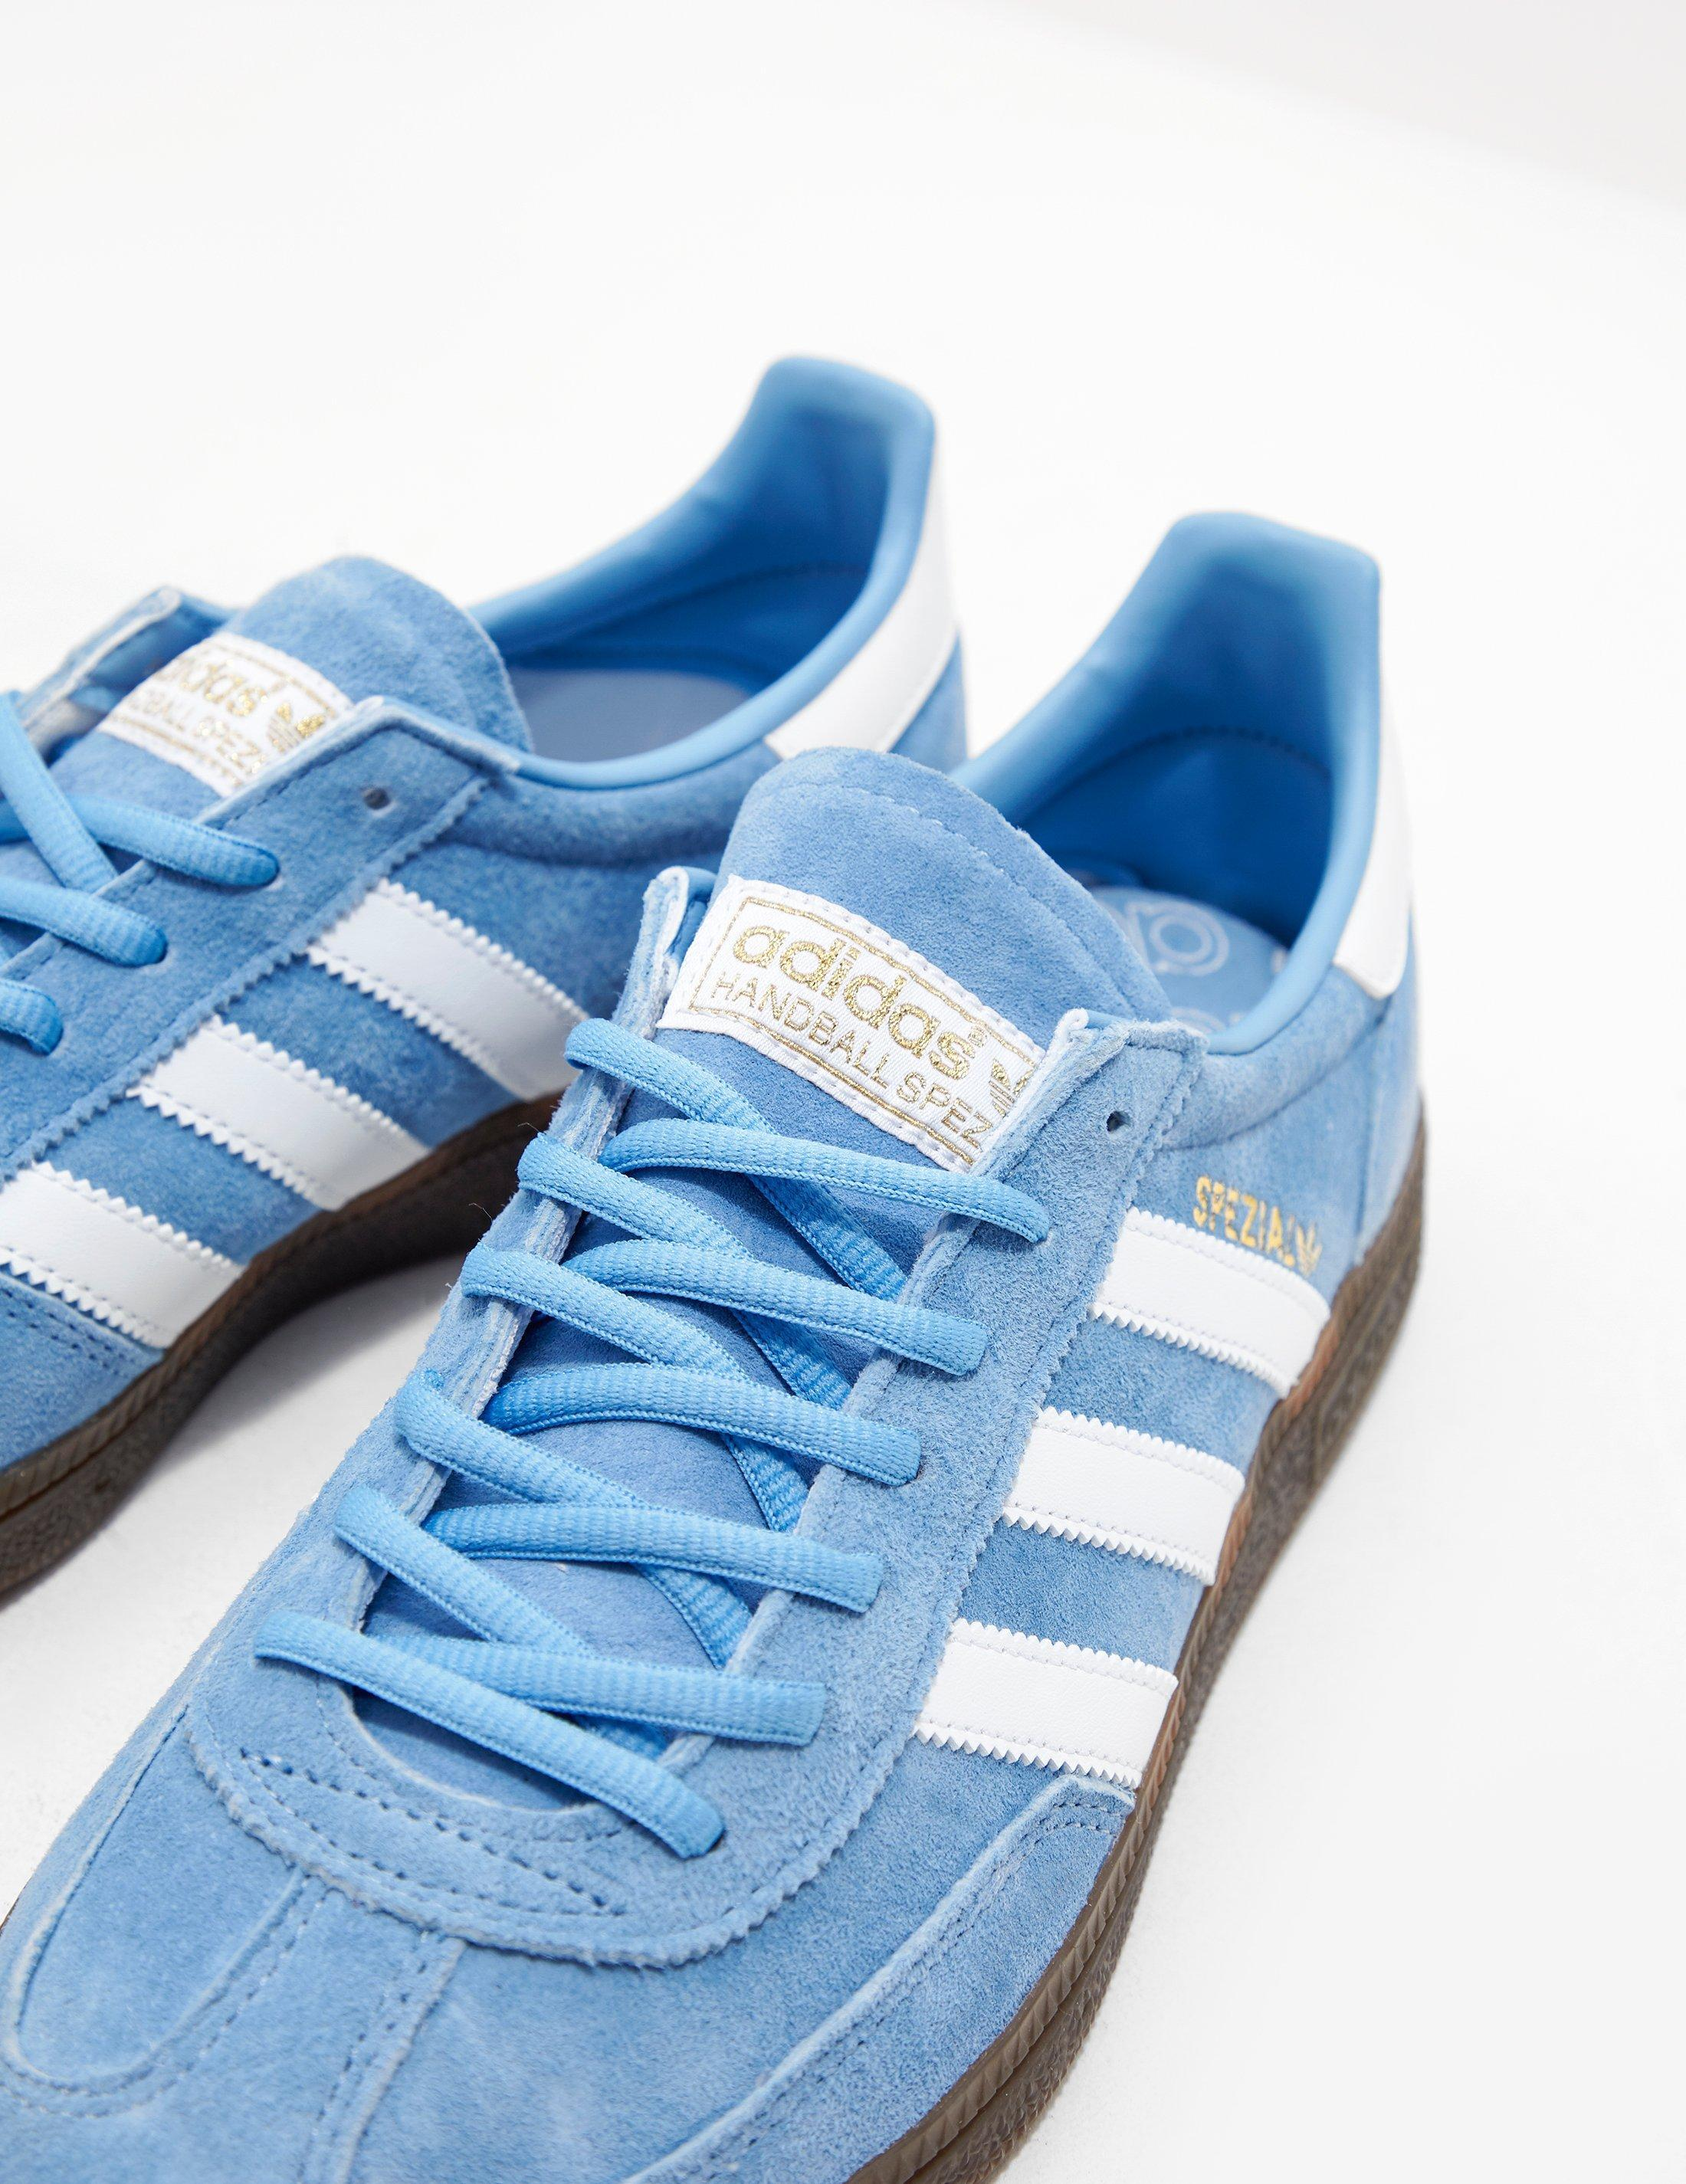 outlet store 9ff1a 5876f adidas Originals Handball Spezial Blue in Blue for Men - Lyst